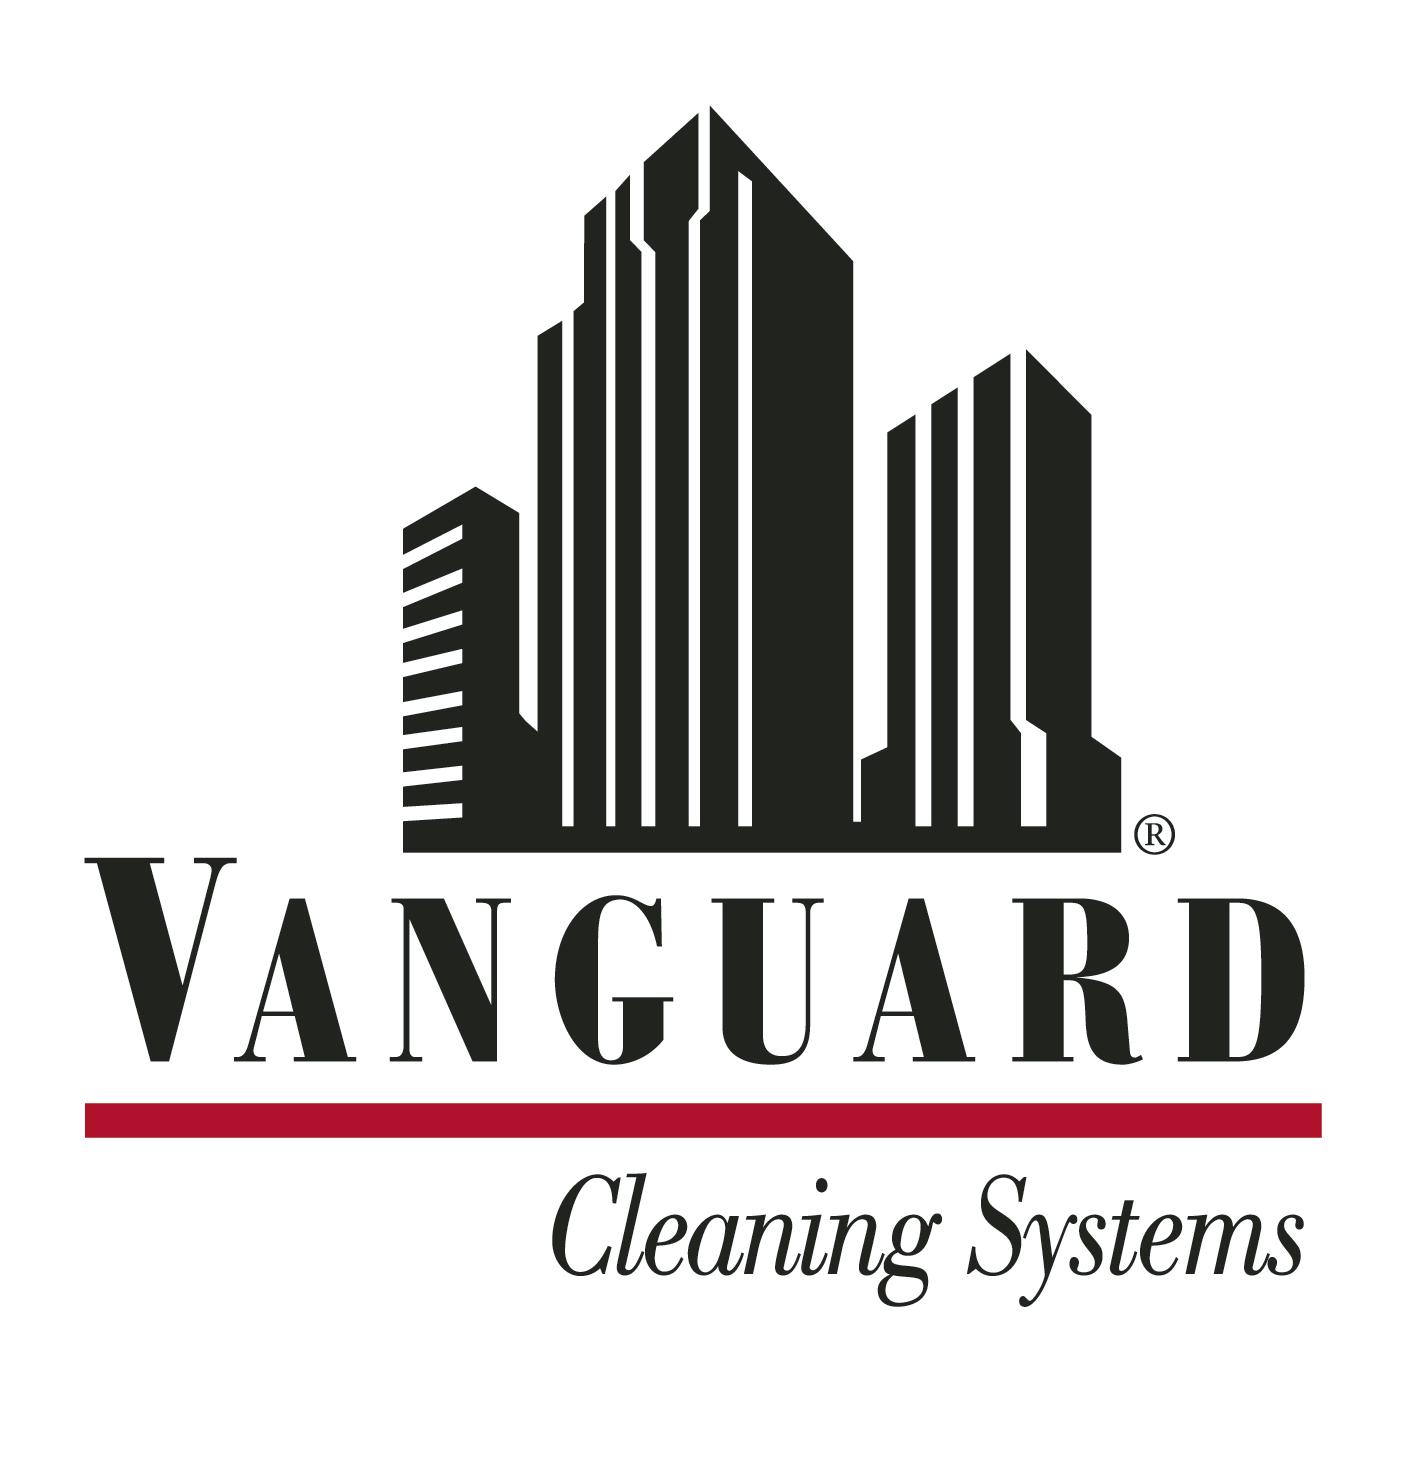 vanguard health systems